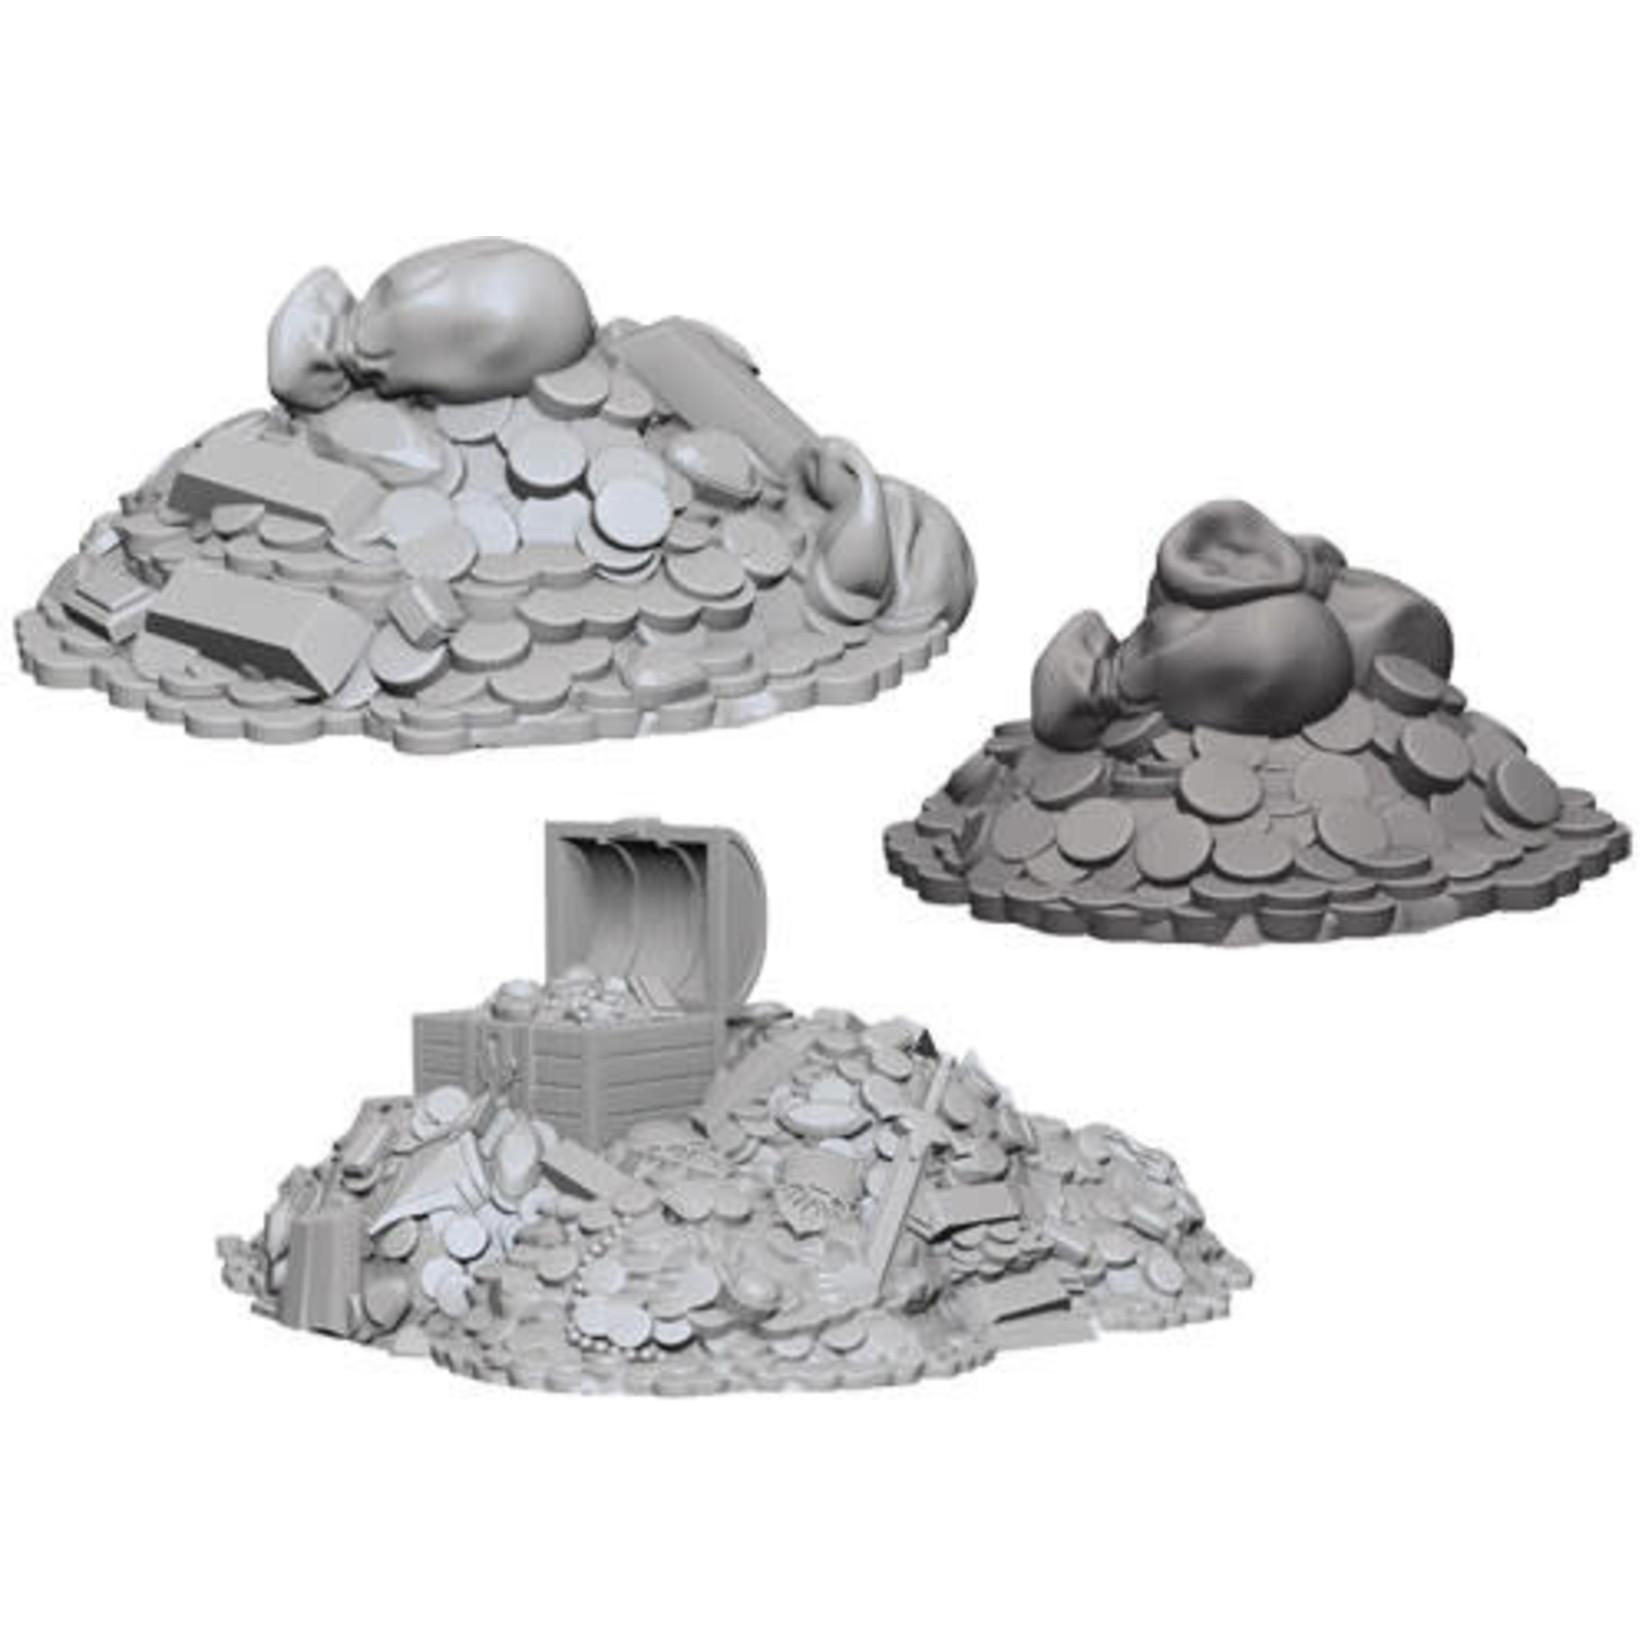 D&D Unpainted Minis: Treasure Piles